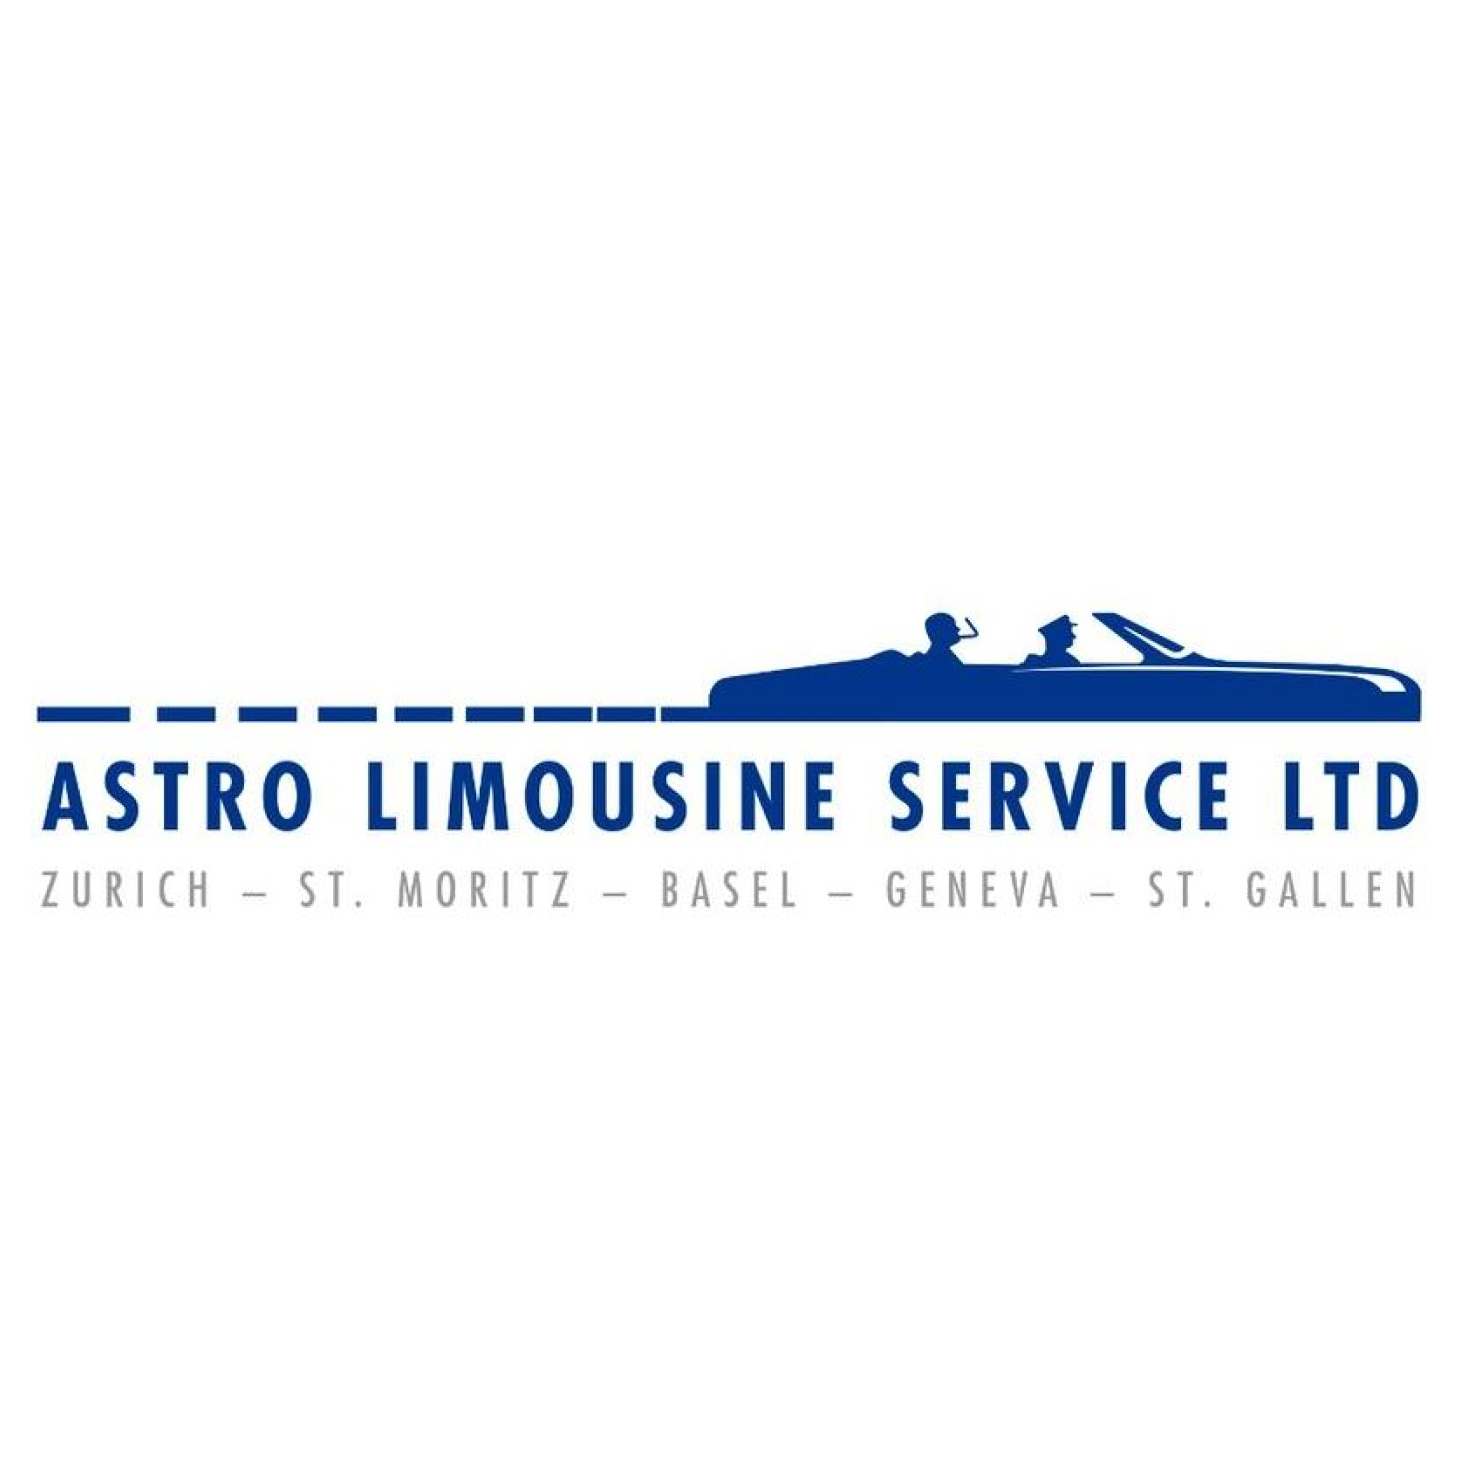 Logos_Sponsoren_astro